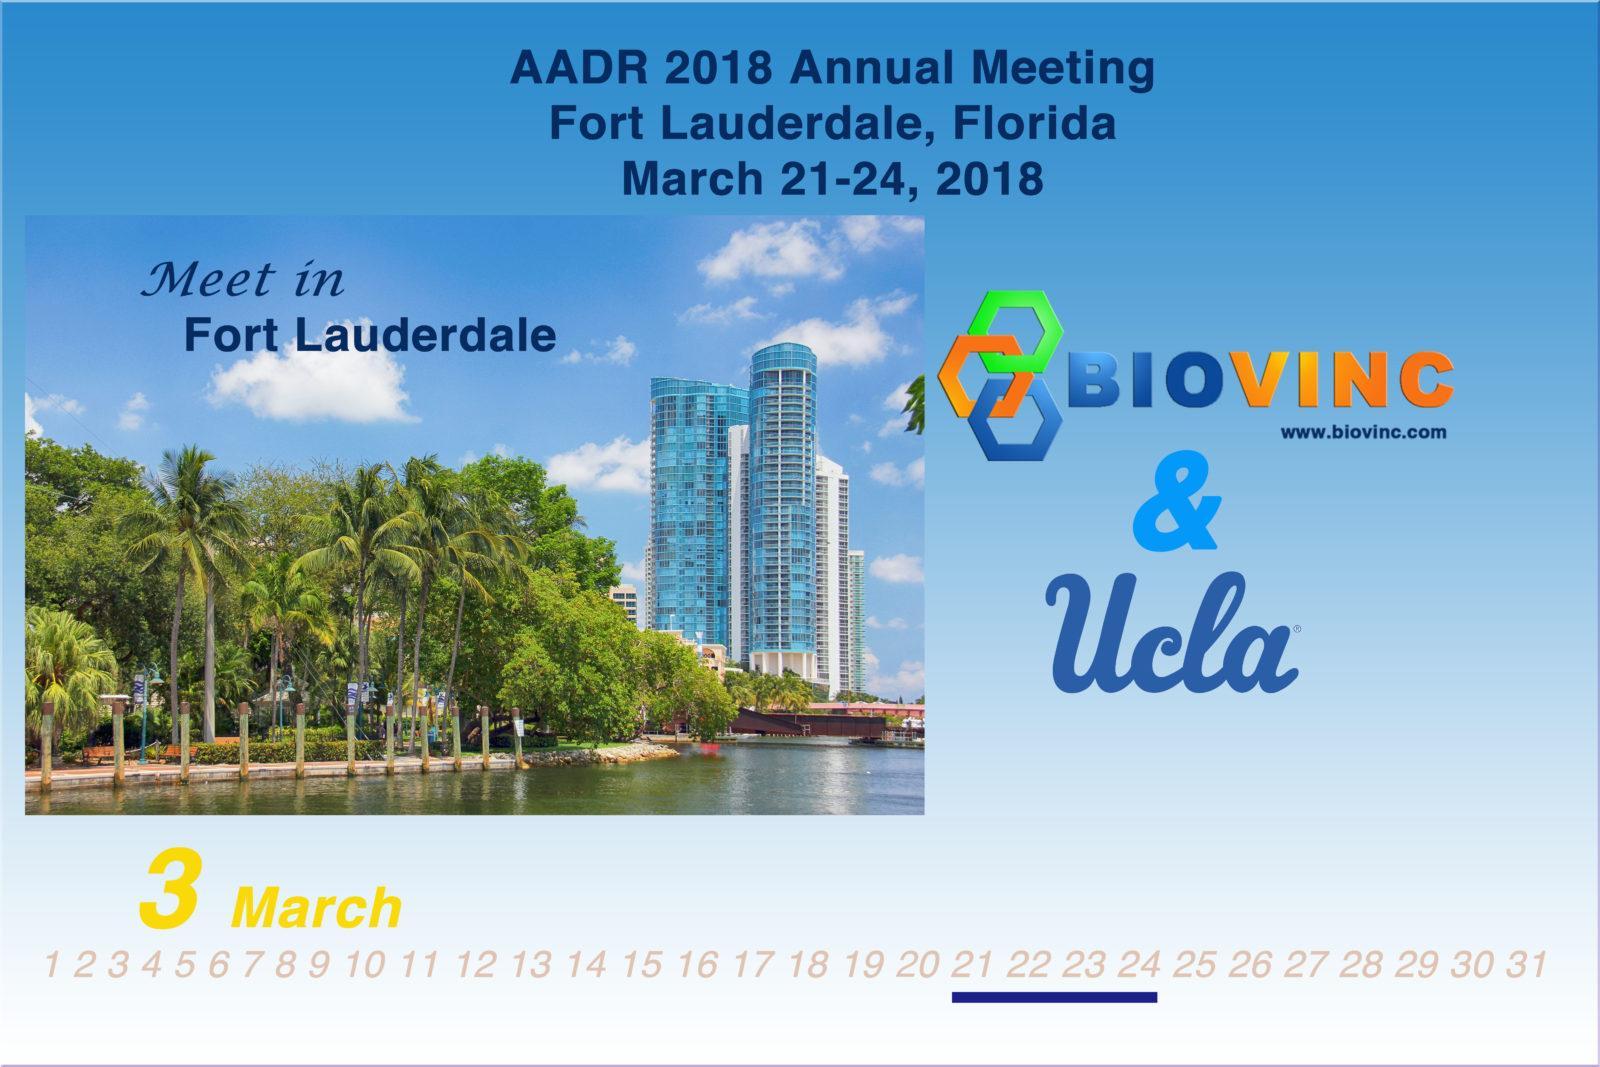 BioVinc collaborator presentation at the 2018 AADR Annual Meeting